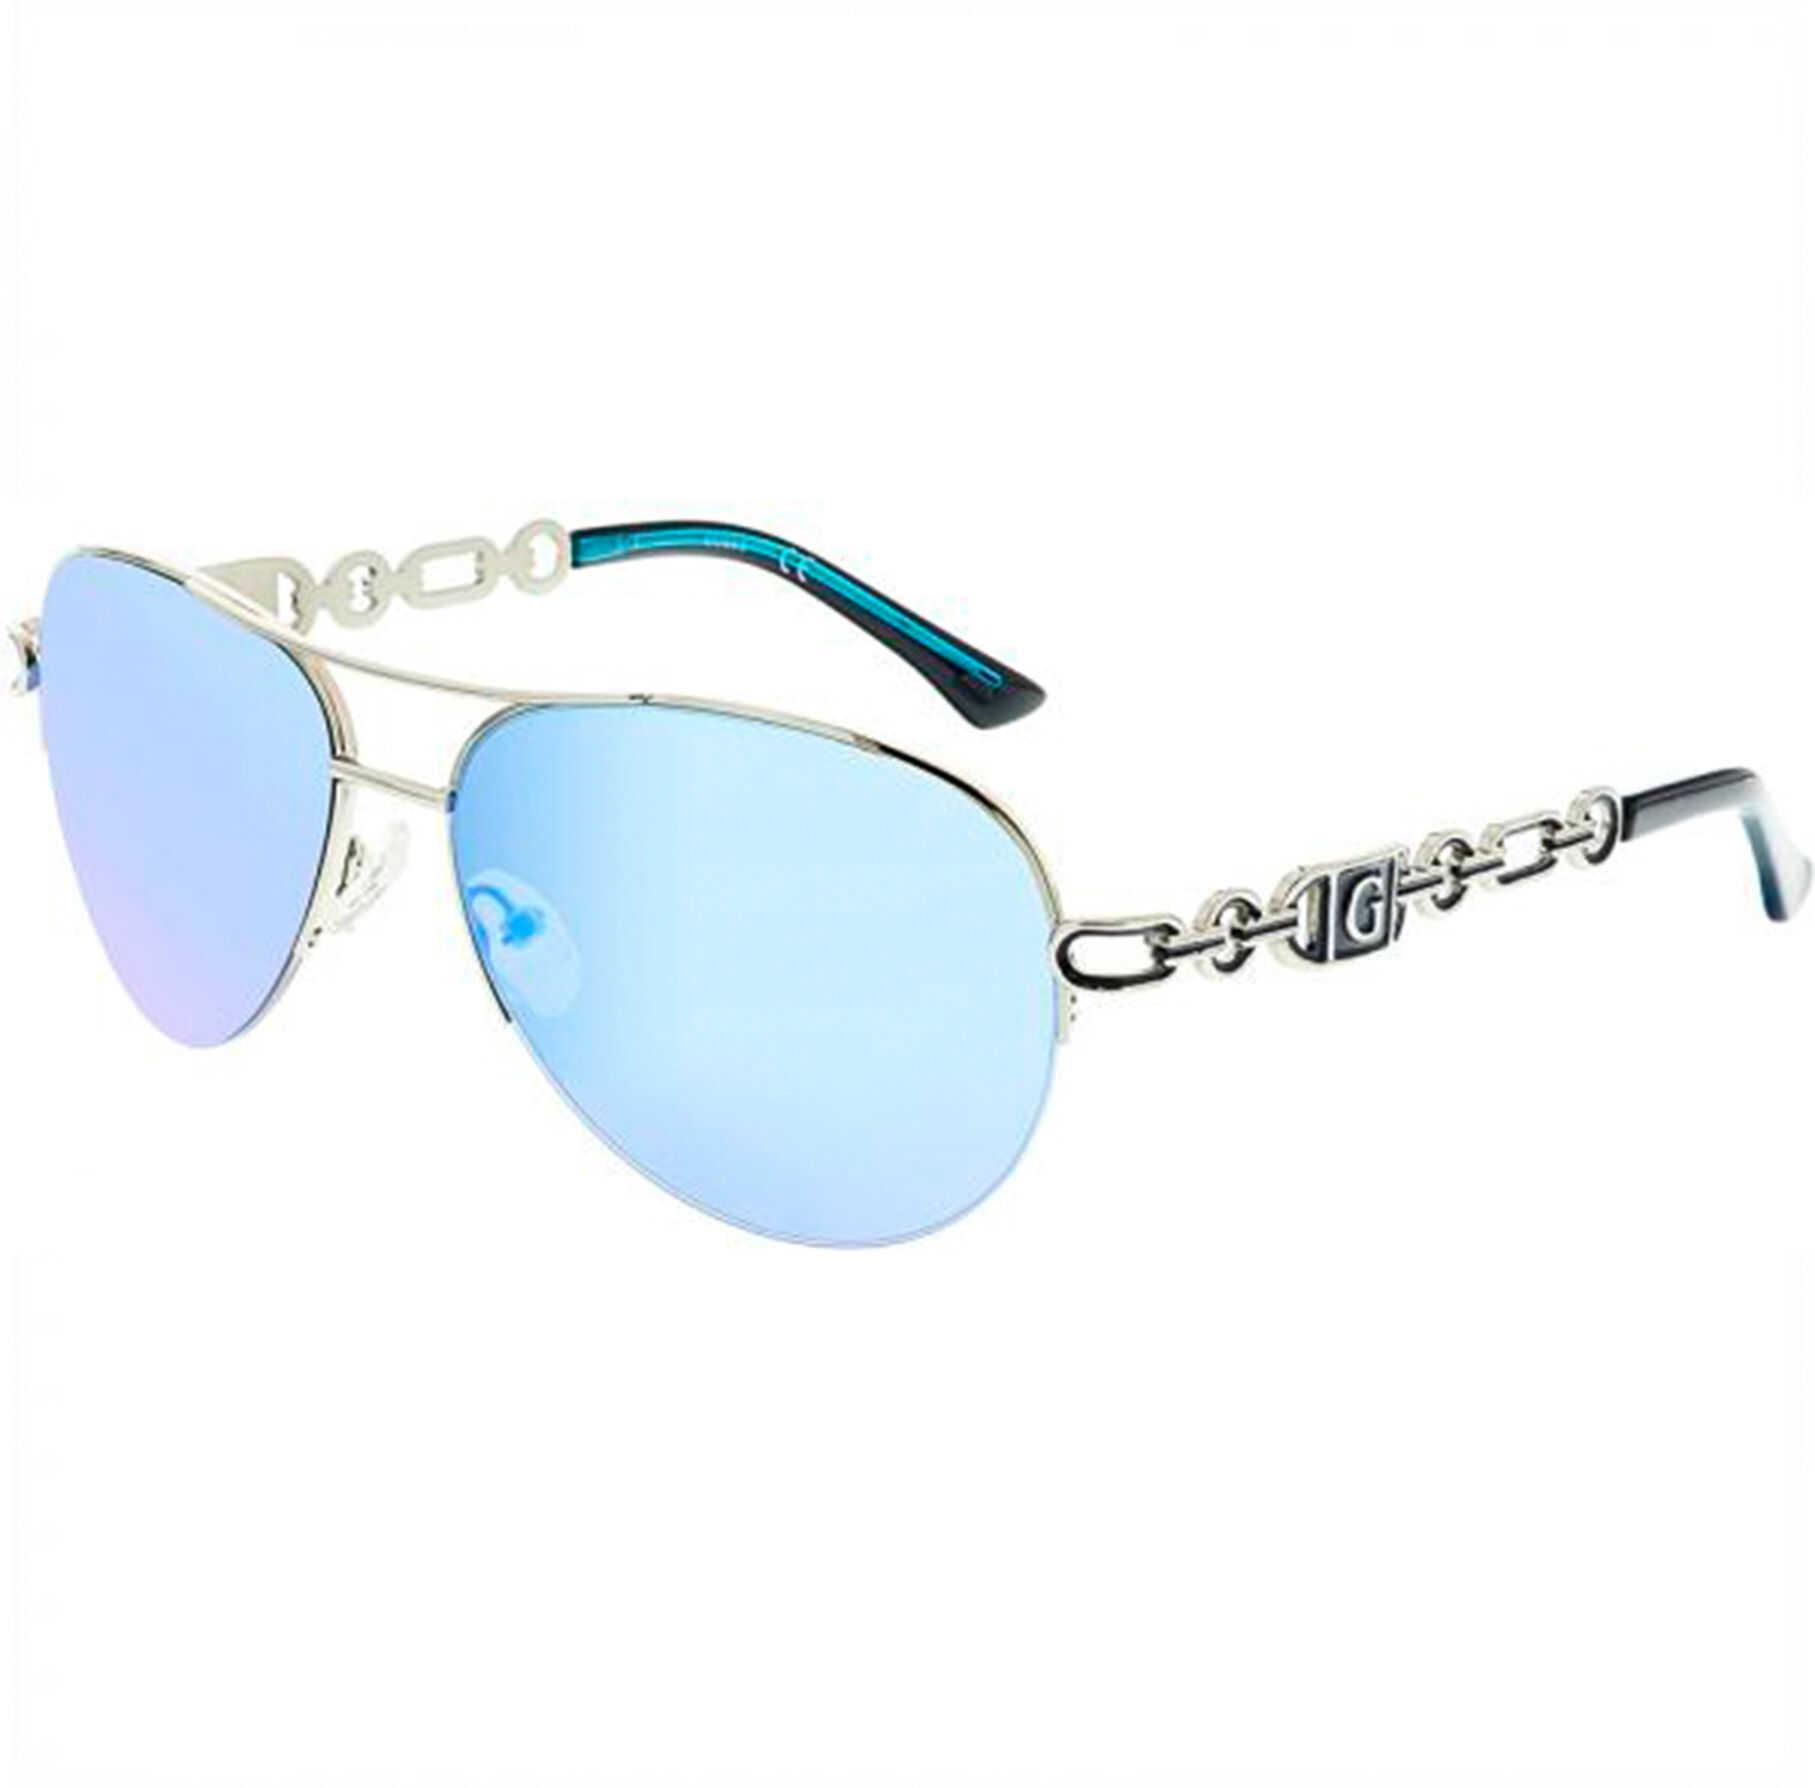 GUESS Gf0257 Blue